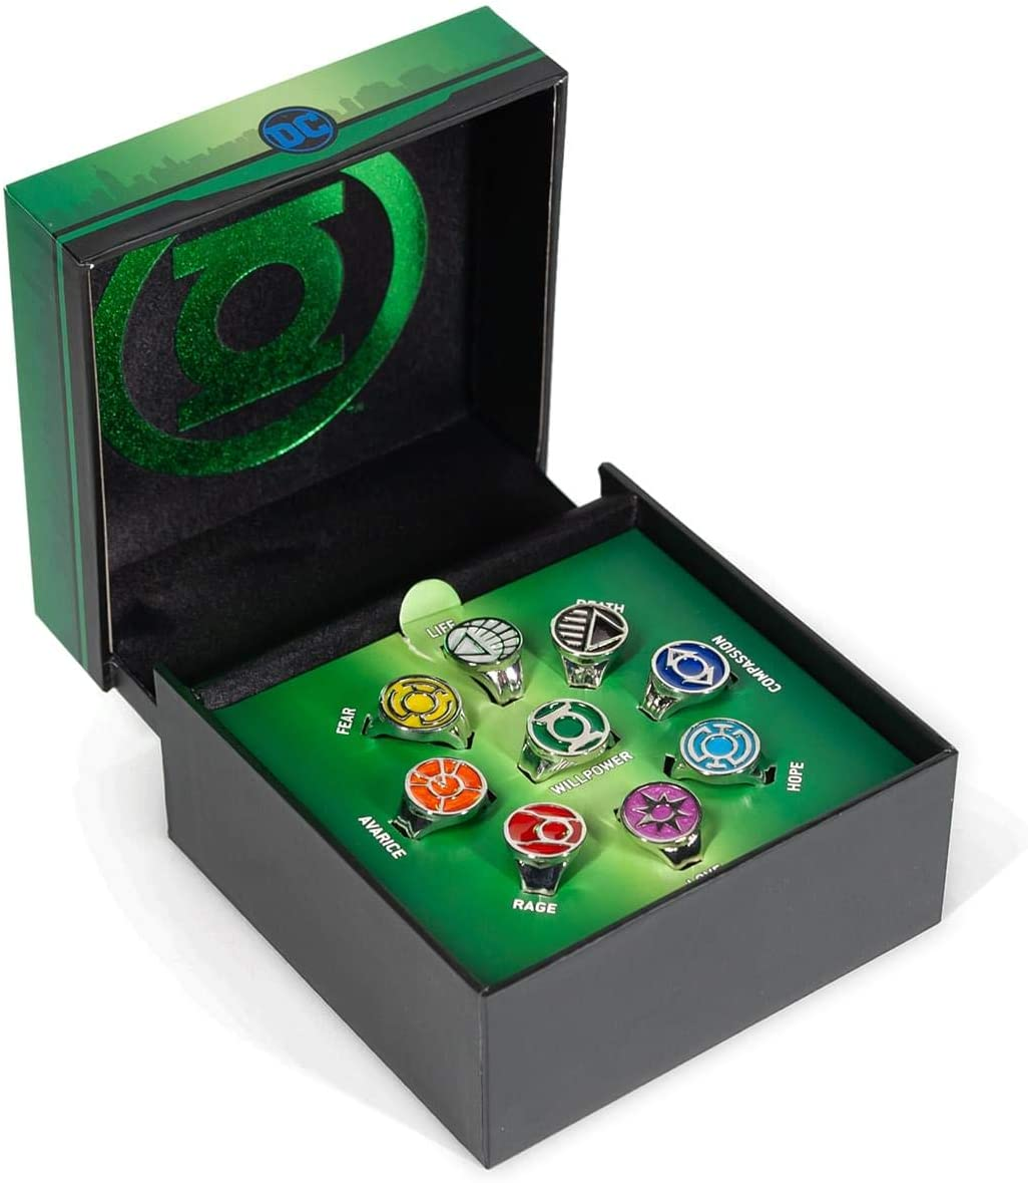 SalesOne LLC DC Comics Green Lantern Power Rings Emotional Spectrum Power Rings | Includes 9 Adjustable Rings Featuring Each Power Ring Emotion